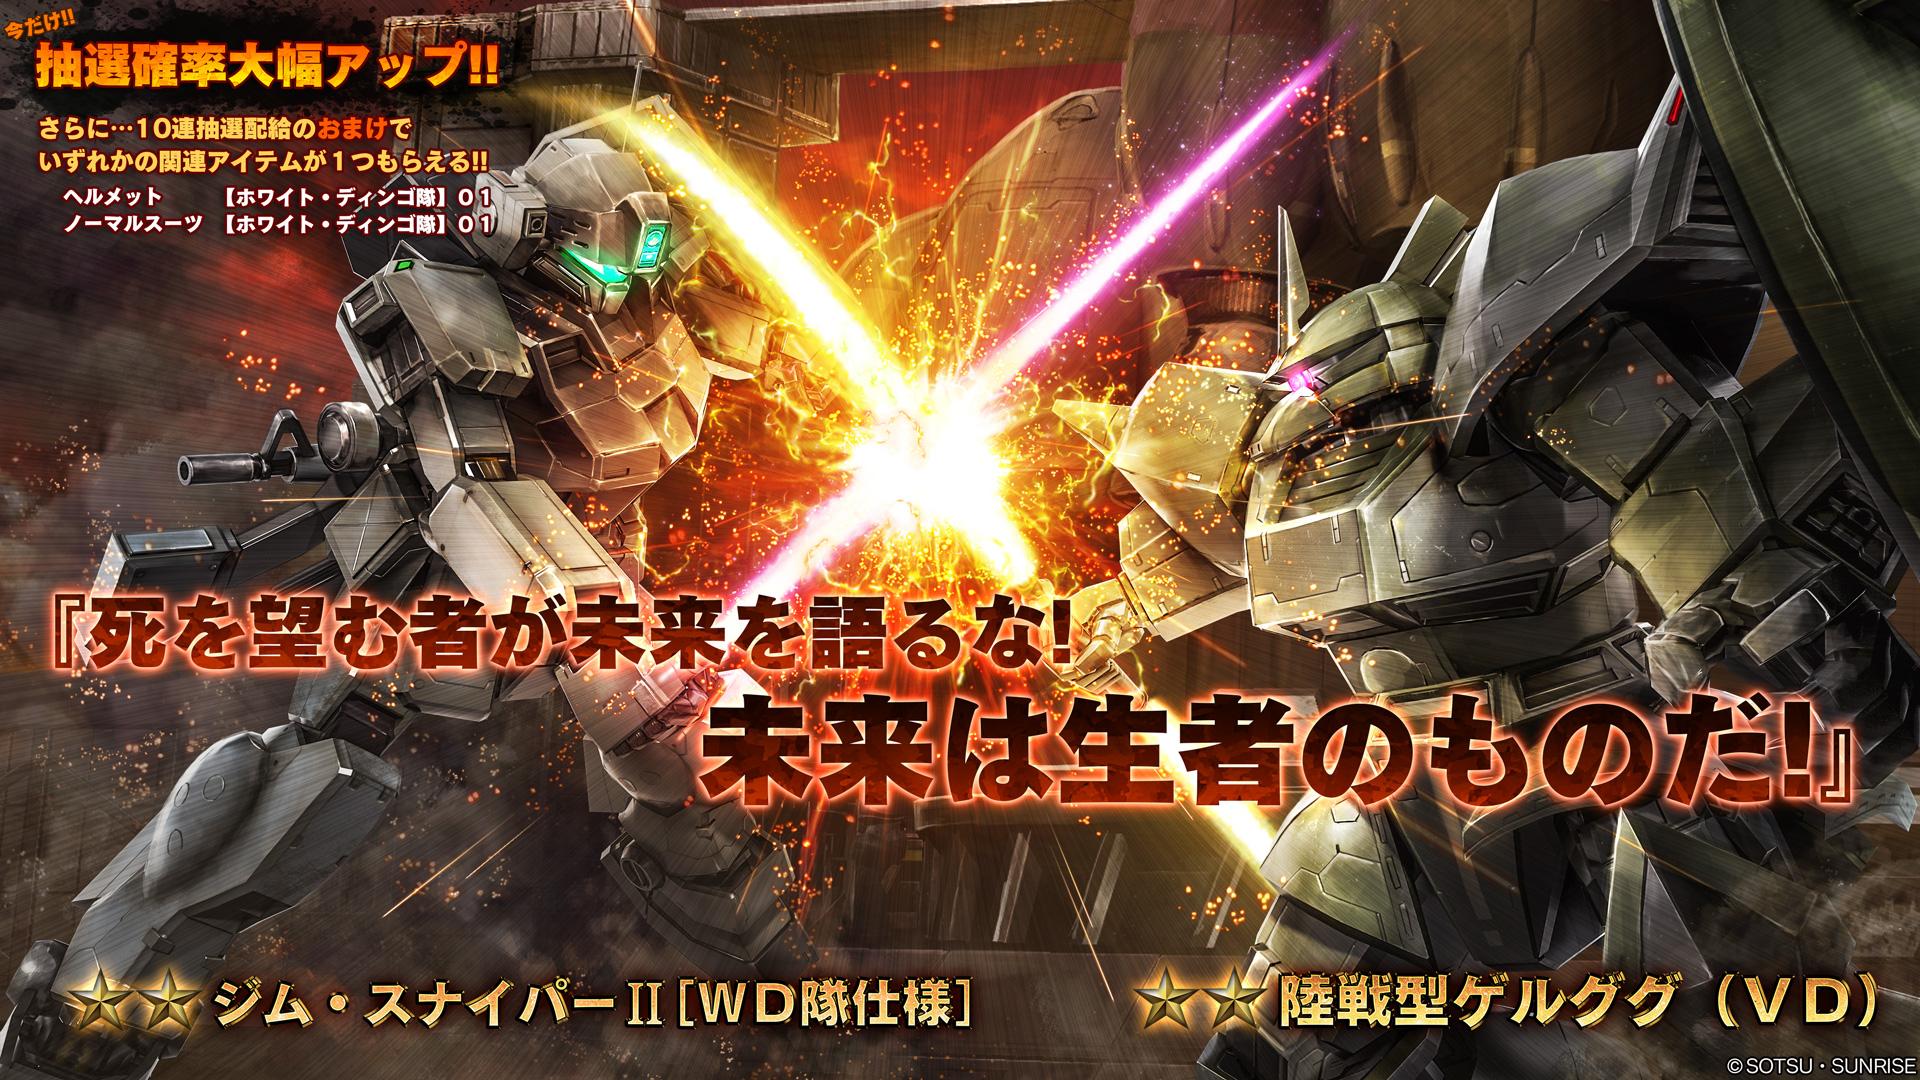 INFORMATION Mobile Suit Gundam Battle Operation 2 BANDAI NAMCO 1920x1080